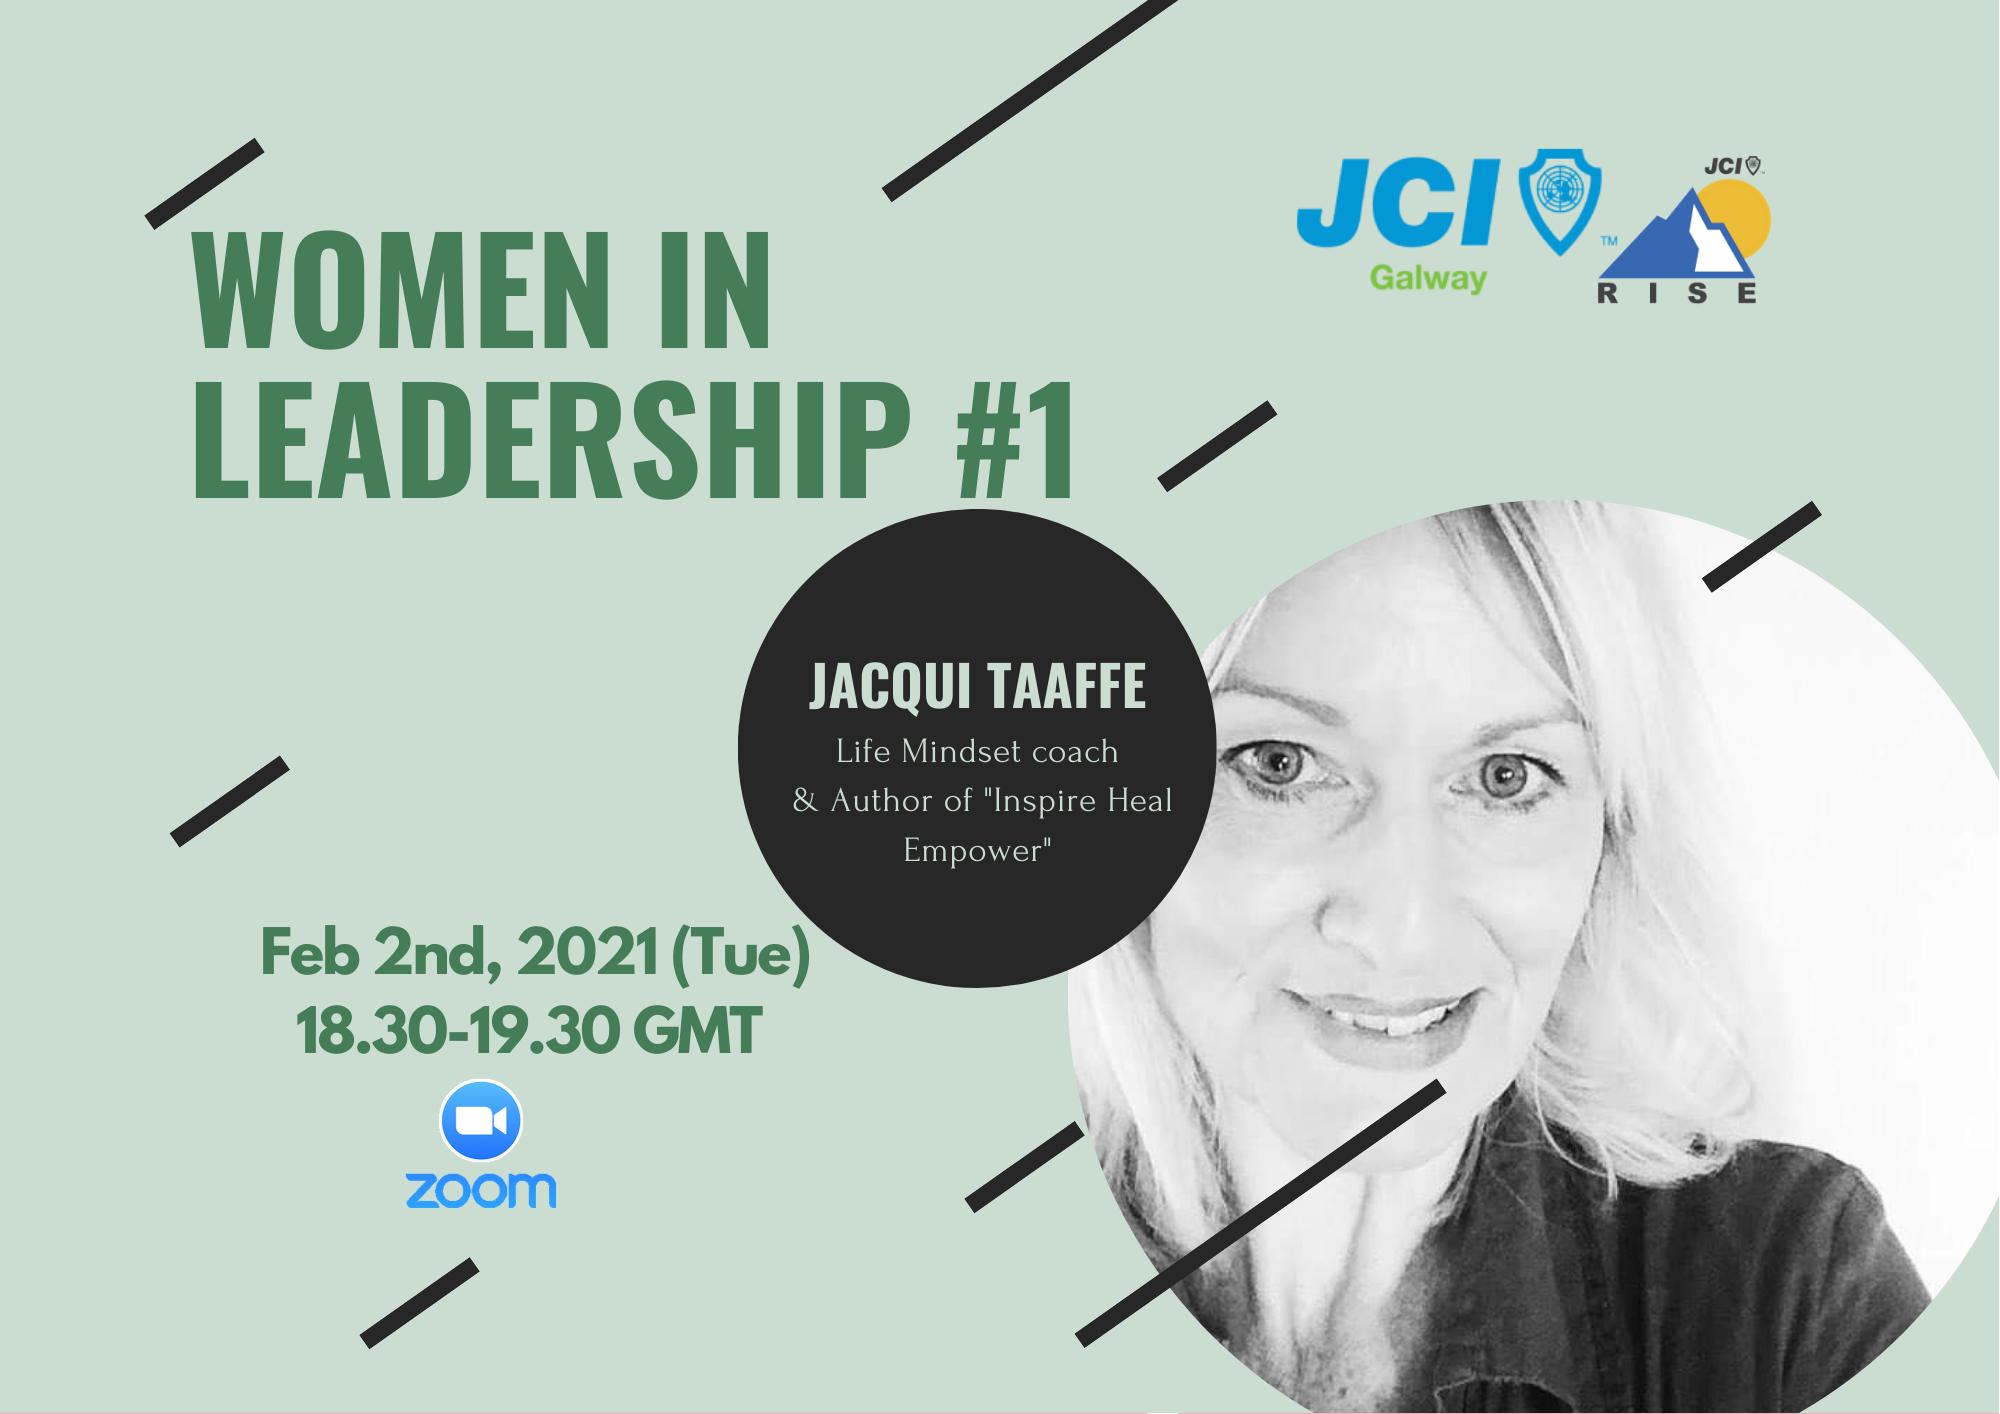 Women in Leadership 1: Presenting Jacqui Taaffe